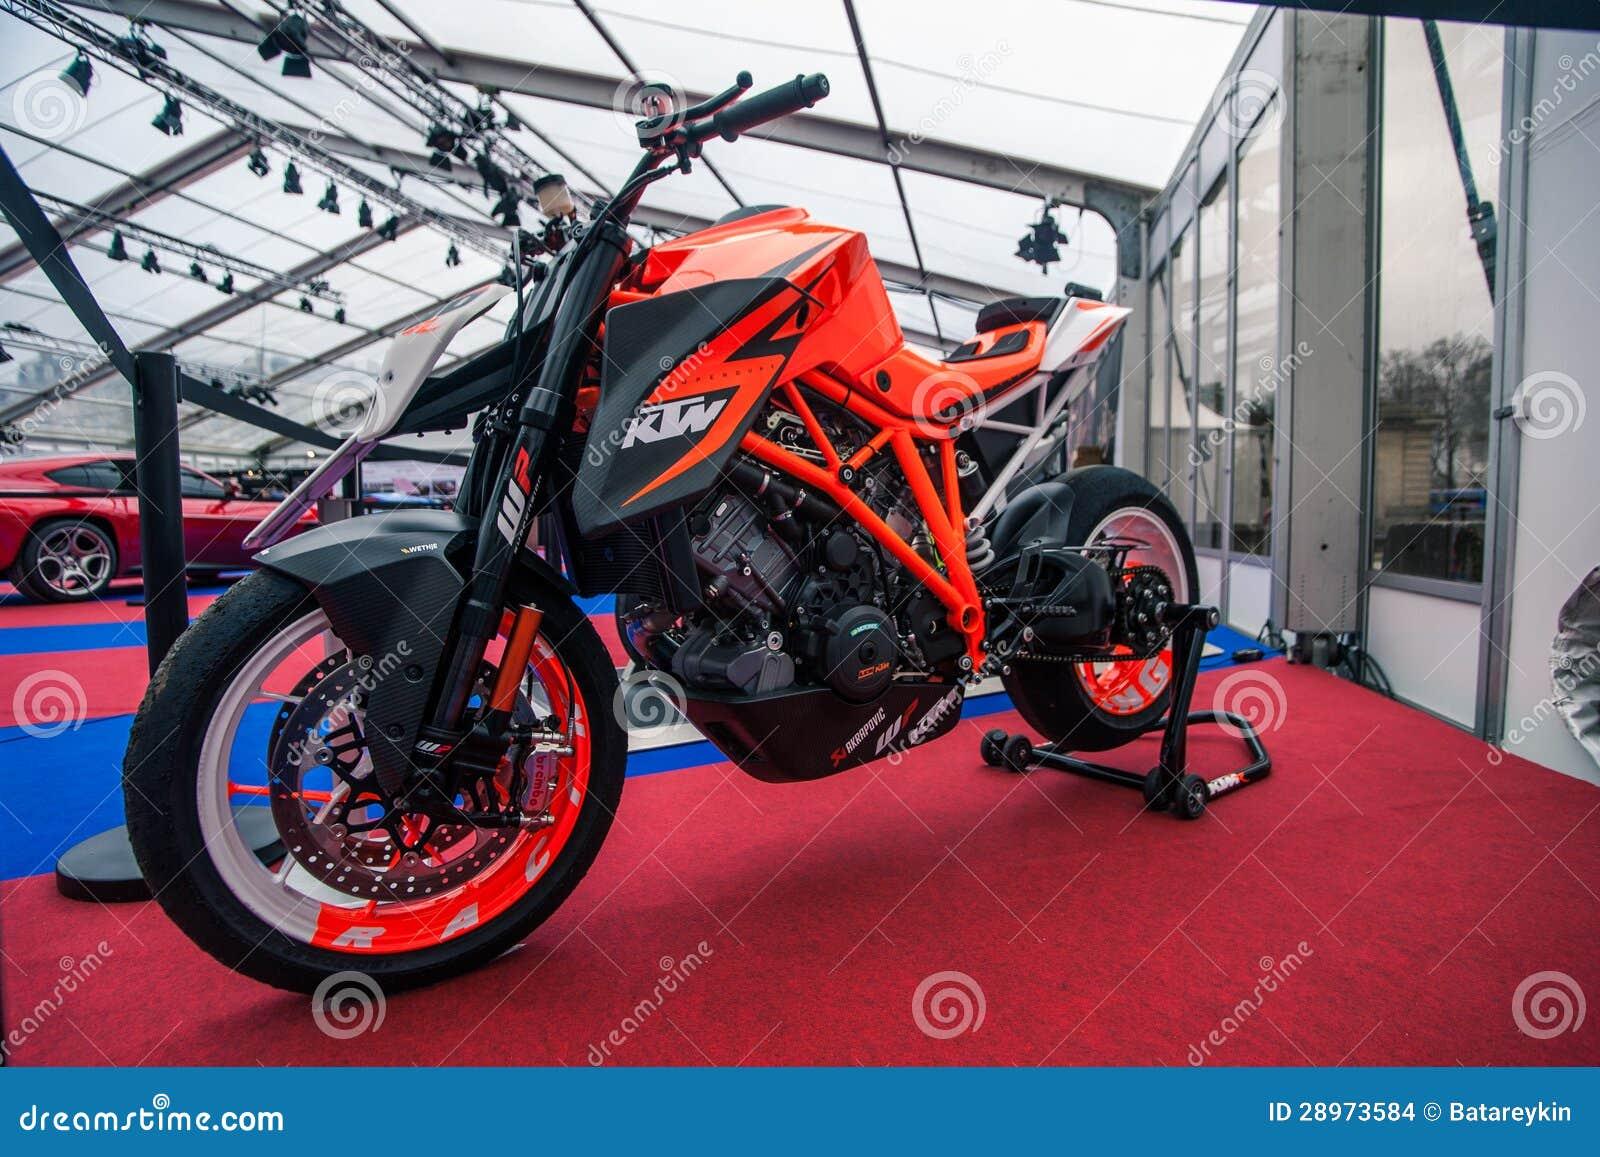 bici ktm del concepto superduke 1190 imagen de archivo